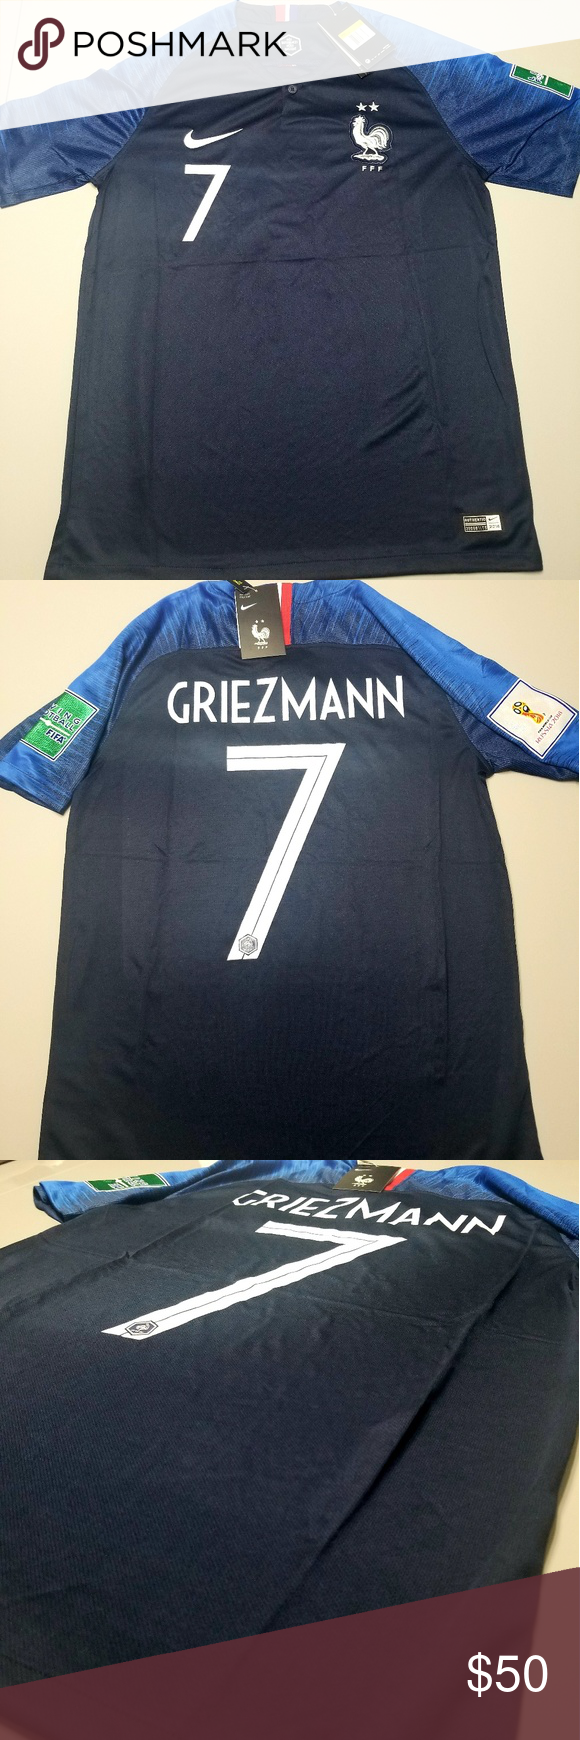 b61dbc32205 New 2 Stars France World Cup Jersey Griezmann New Champions New Star 2  Stars Jersey Griezmann 2018 Winners Jersey Nike Shirts Tees - Short Sleeve